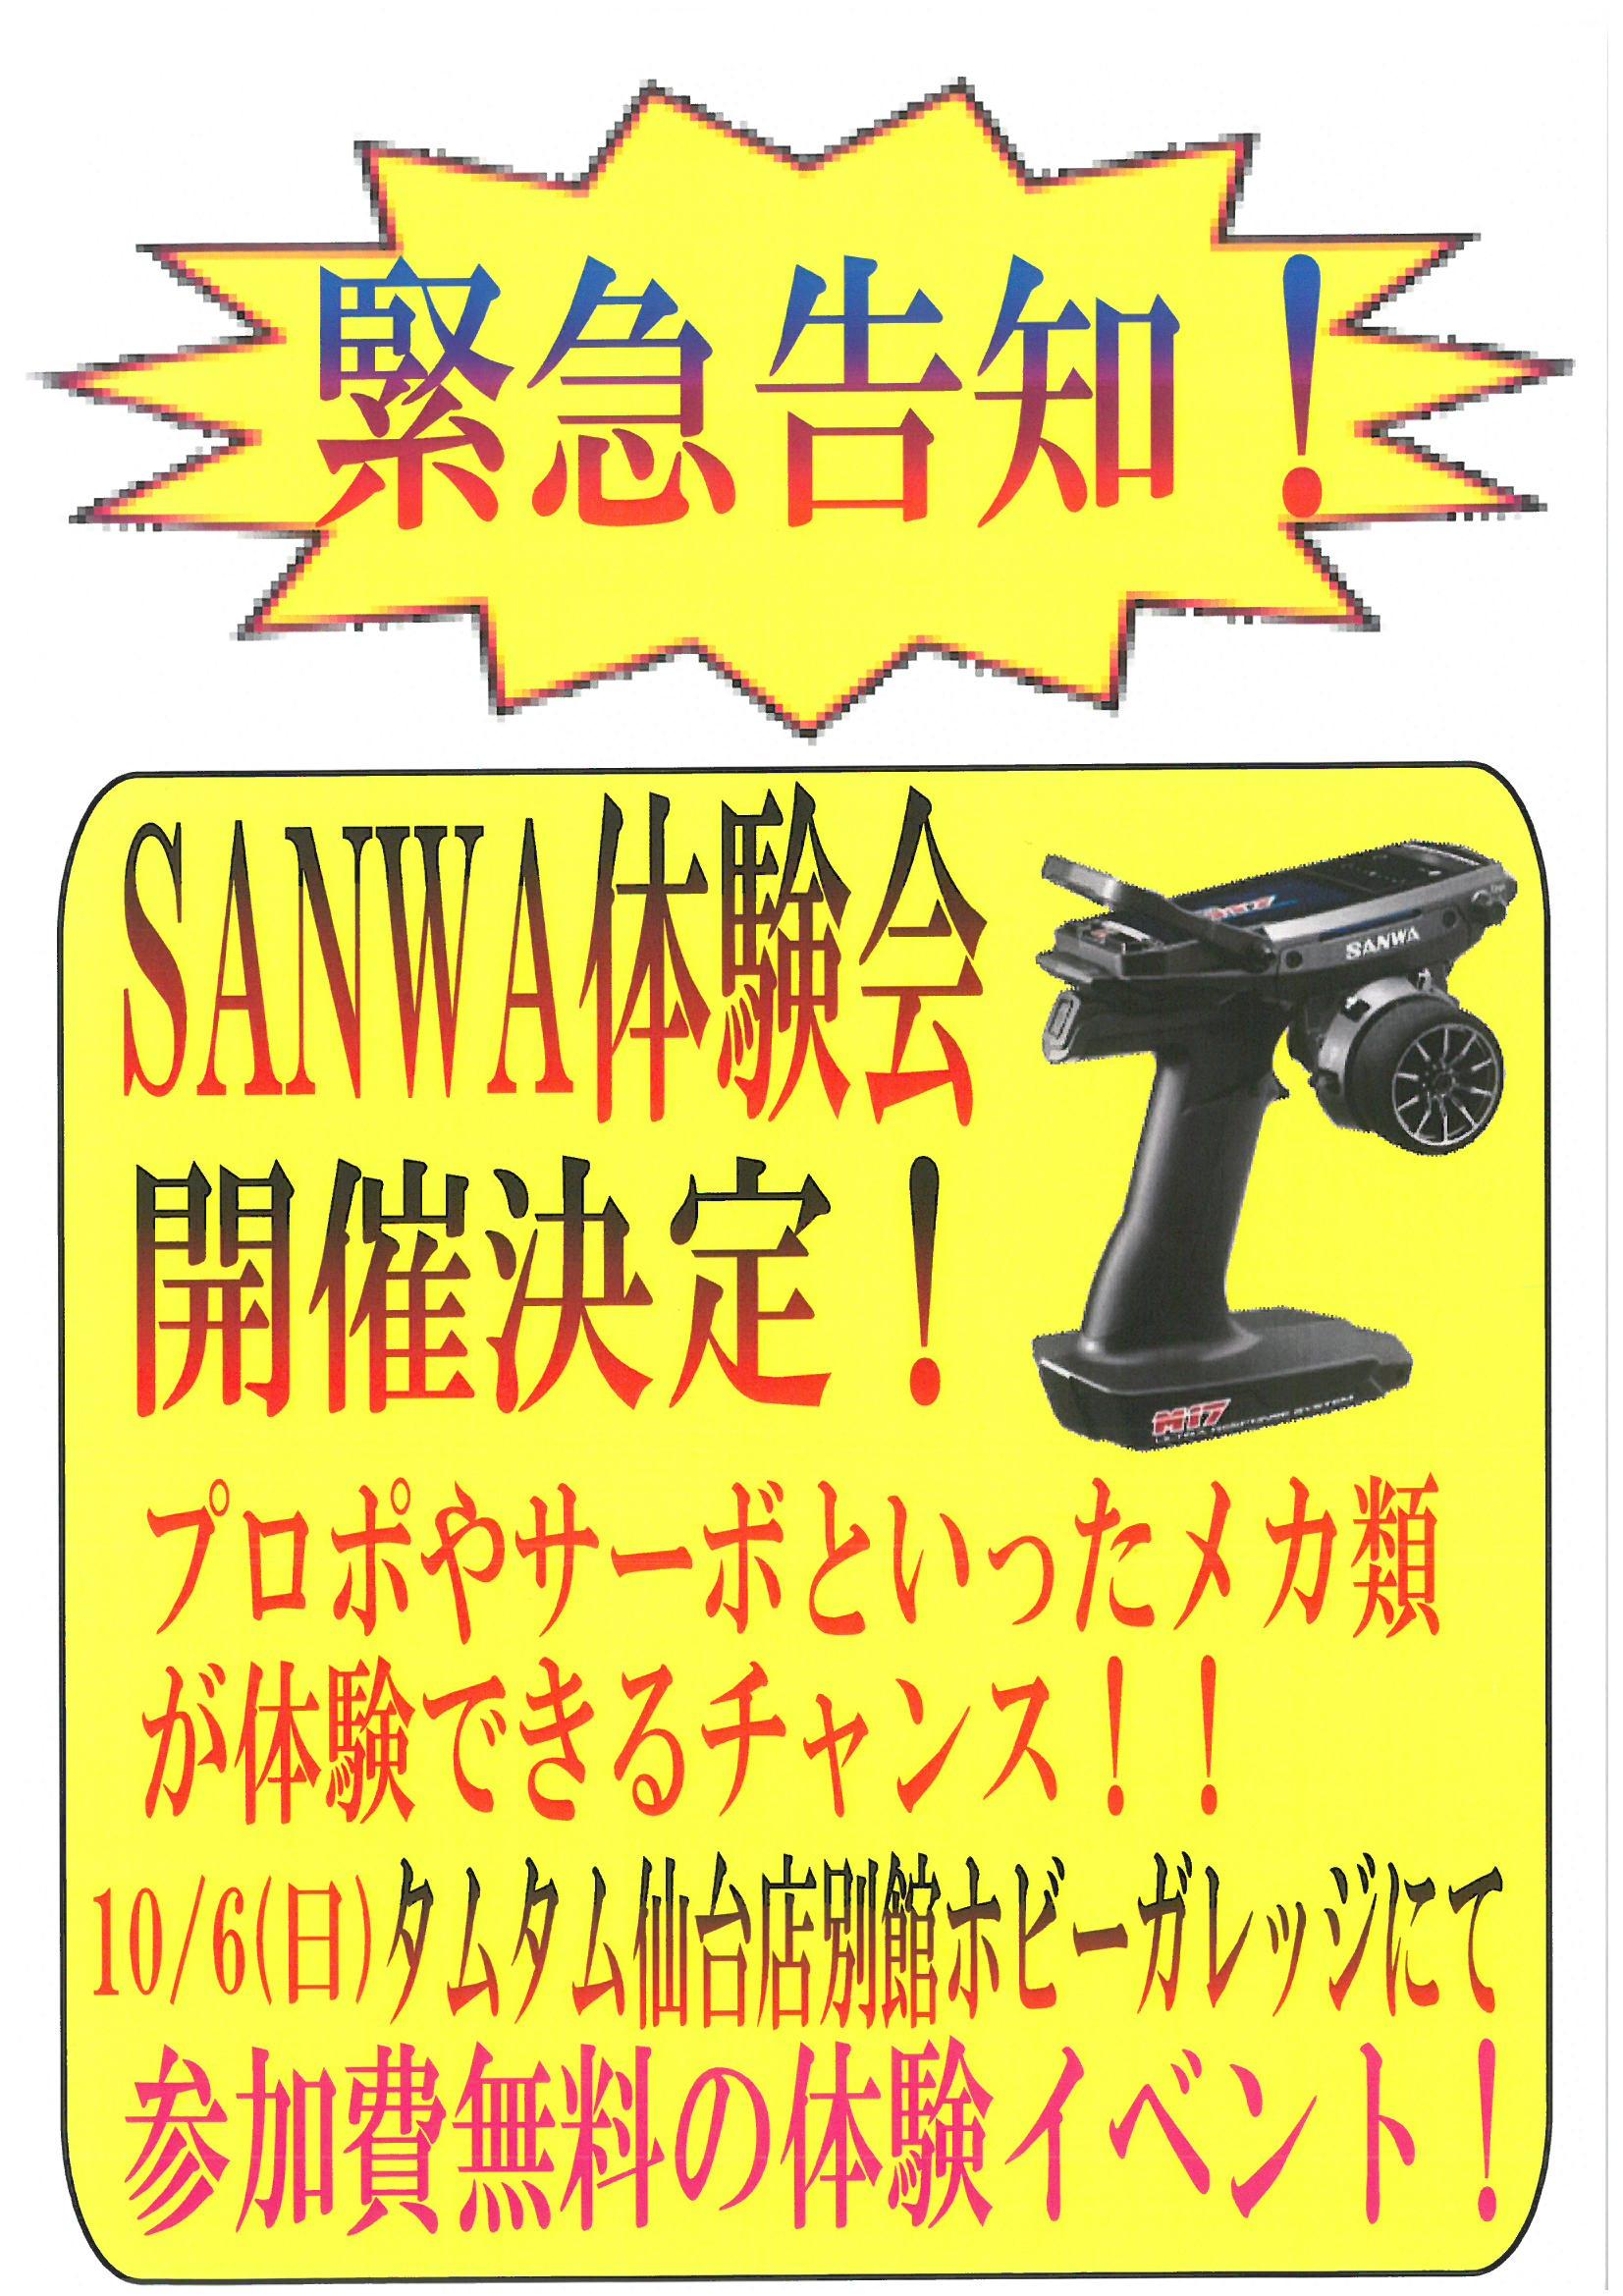 SANWA体験会開催!